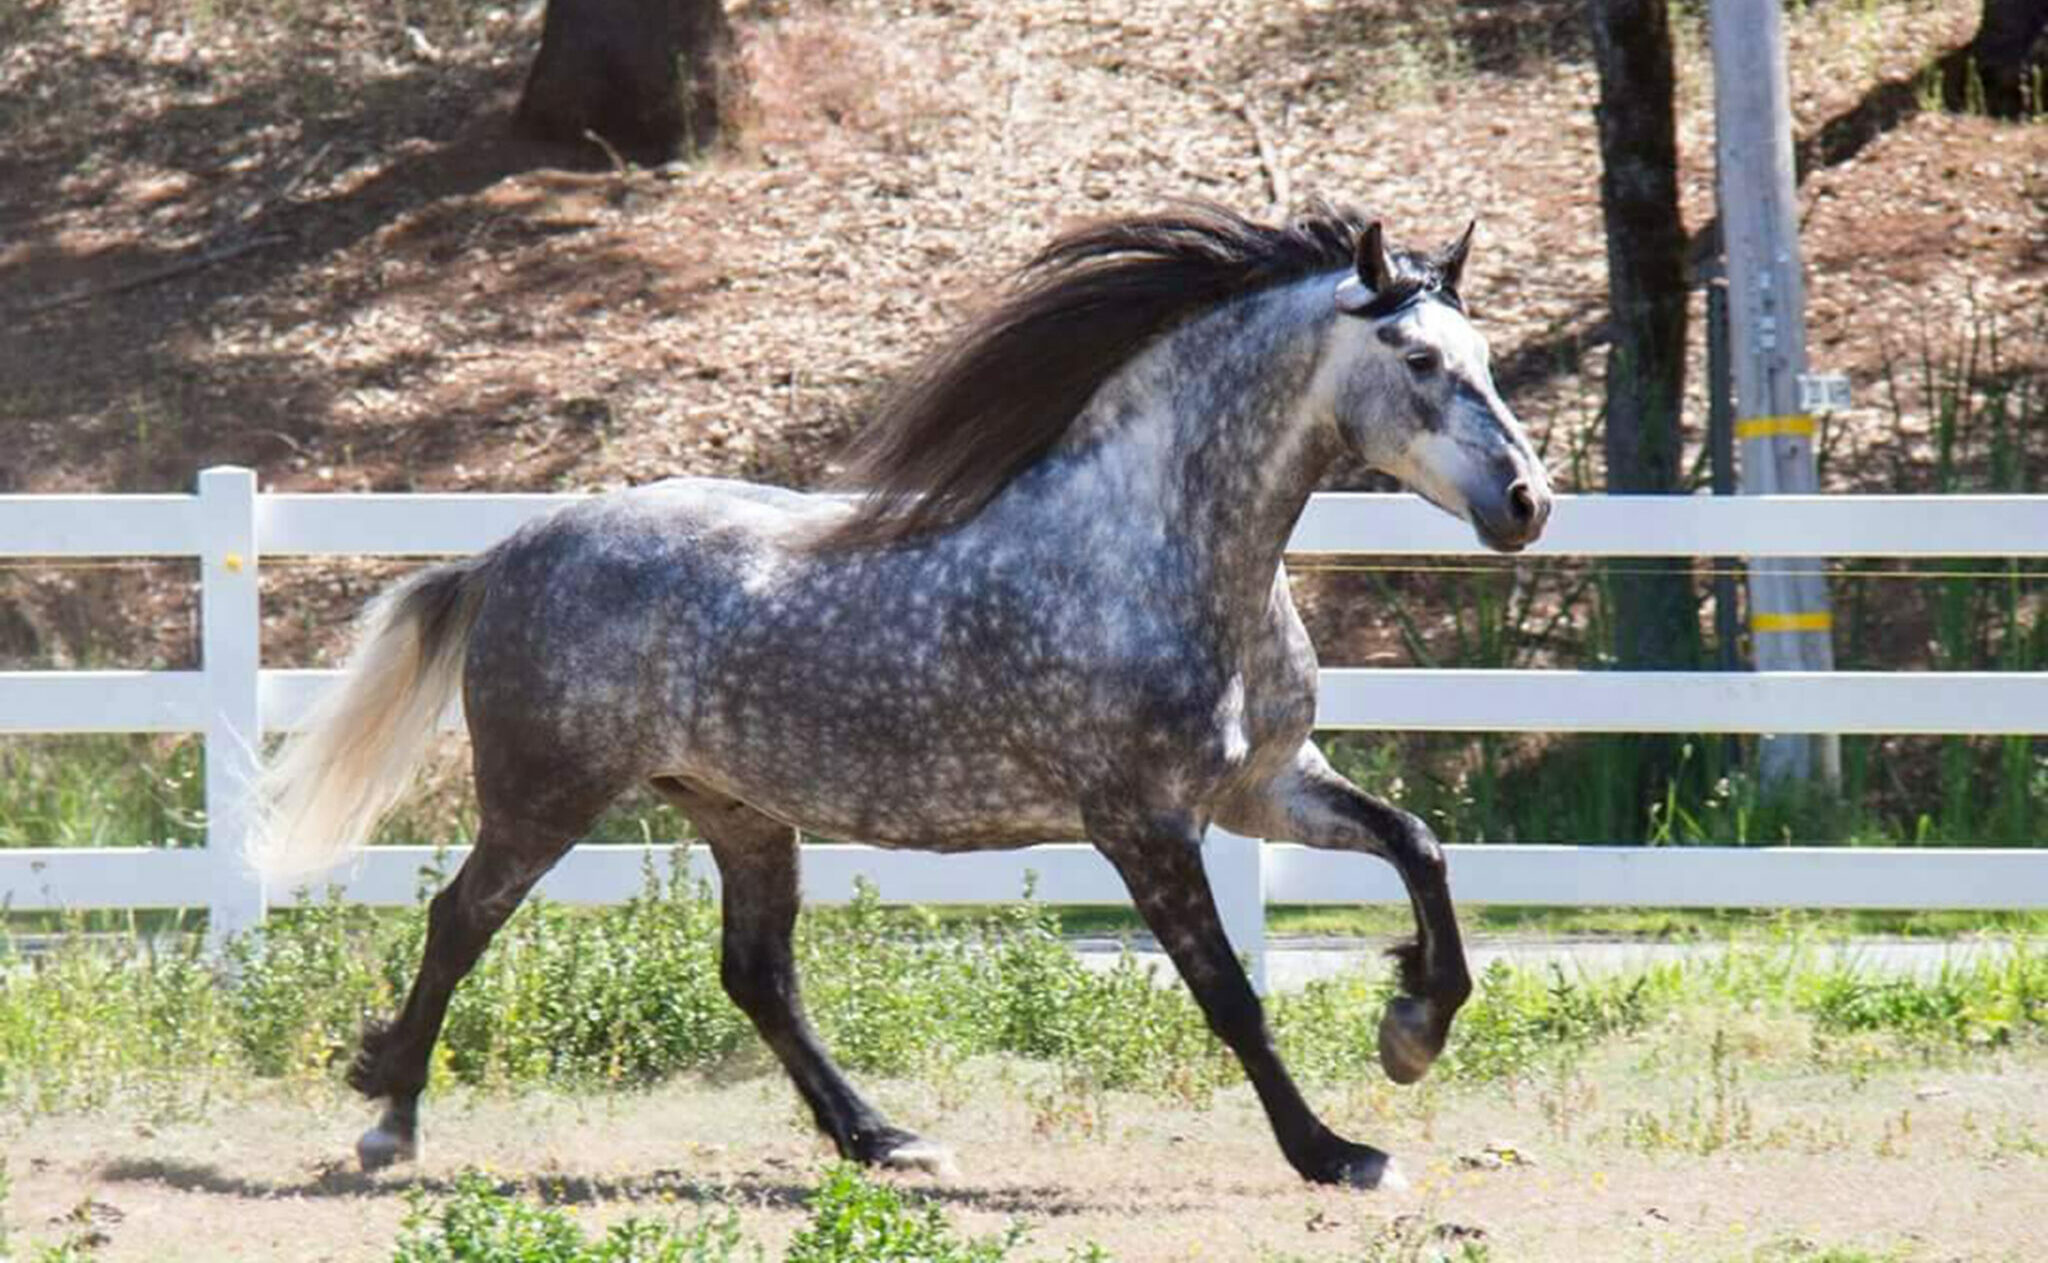 Horse Breed: Warlander - photo by Randy Stewart on Wikimedia Commons - Globetrotting horse riding holidays